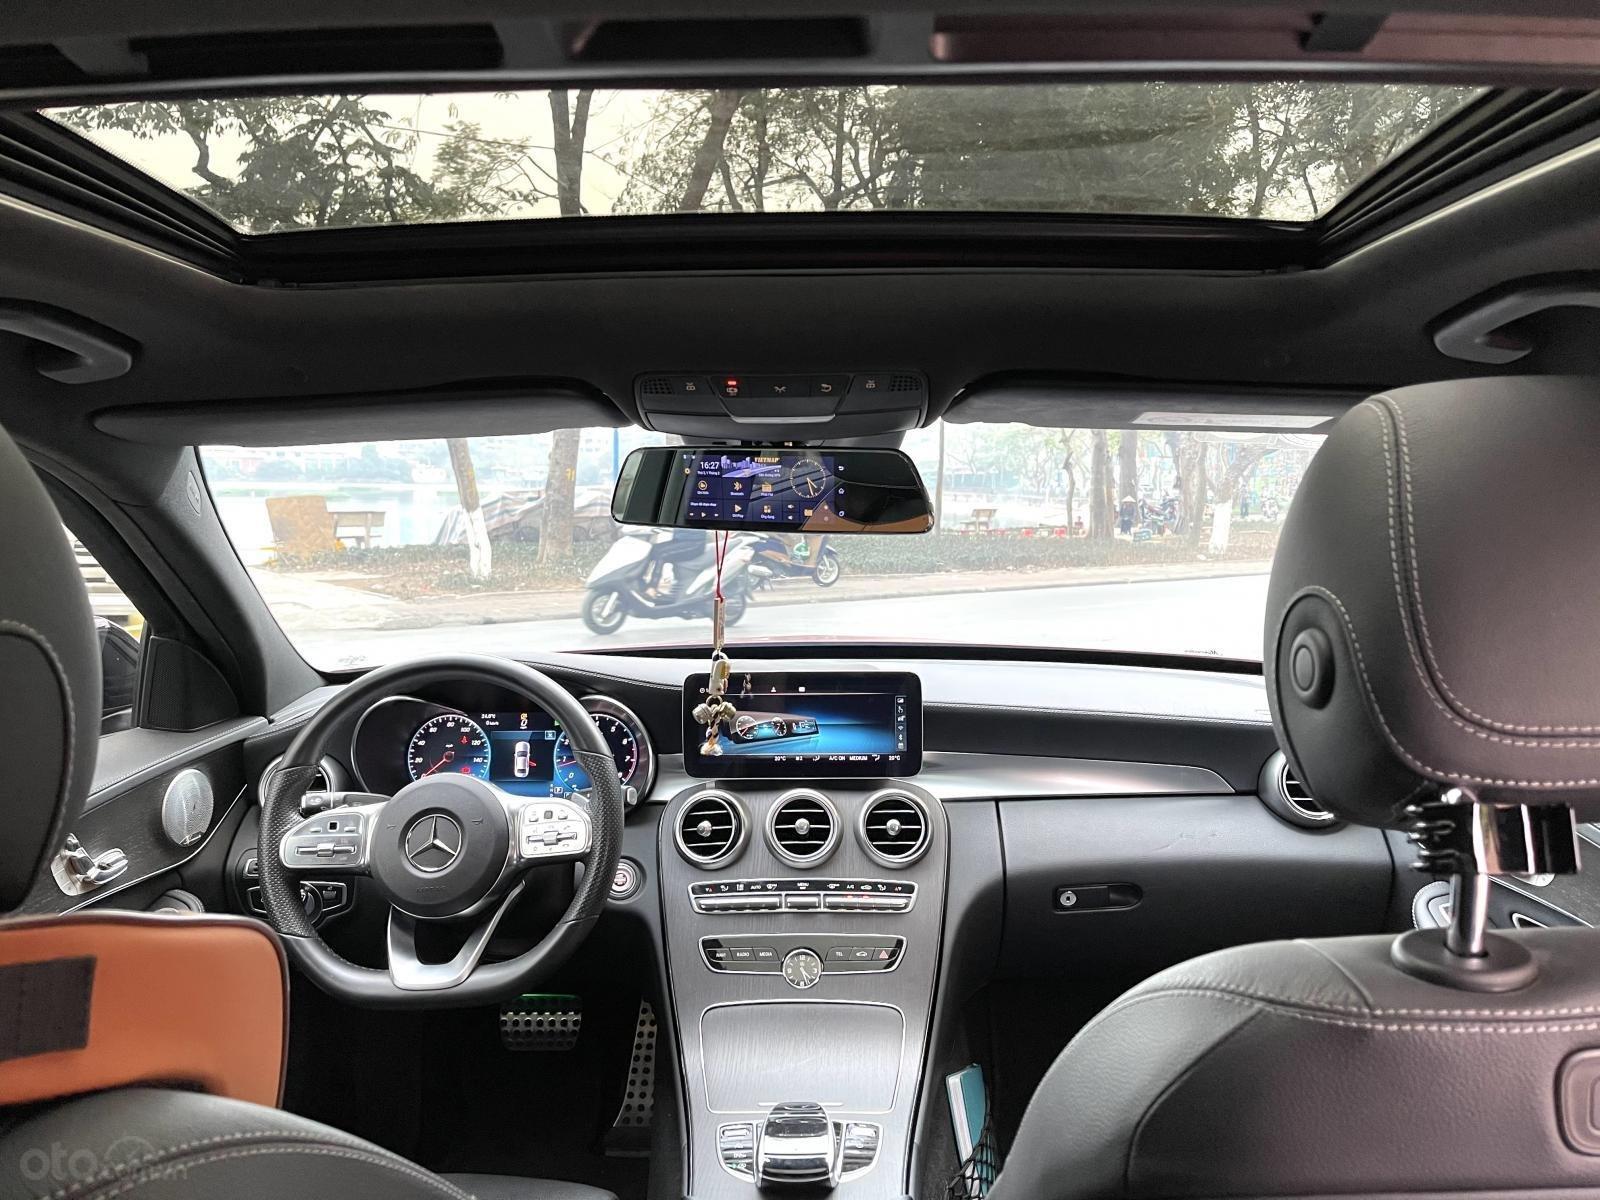 Mercedes Benz C300 AMG model 2019 sản xuất 2018 (13)